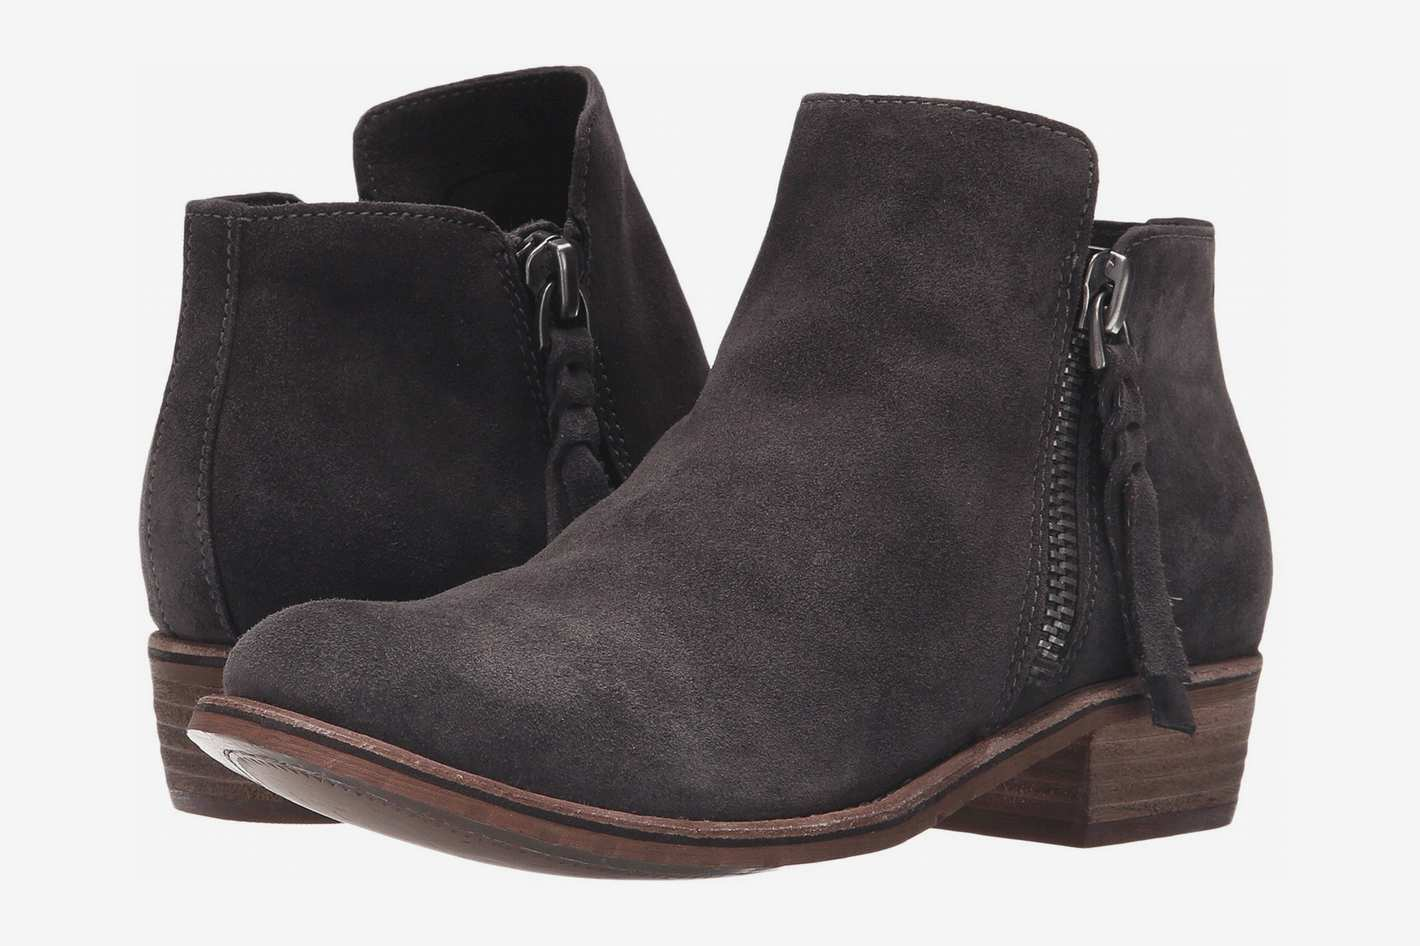 Dolce Vita Sutton Boots